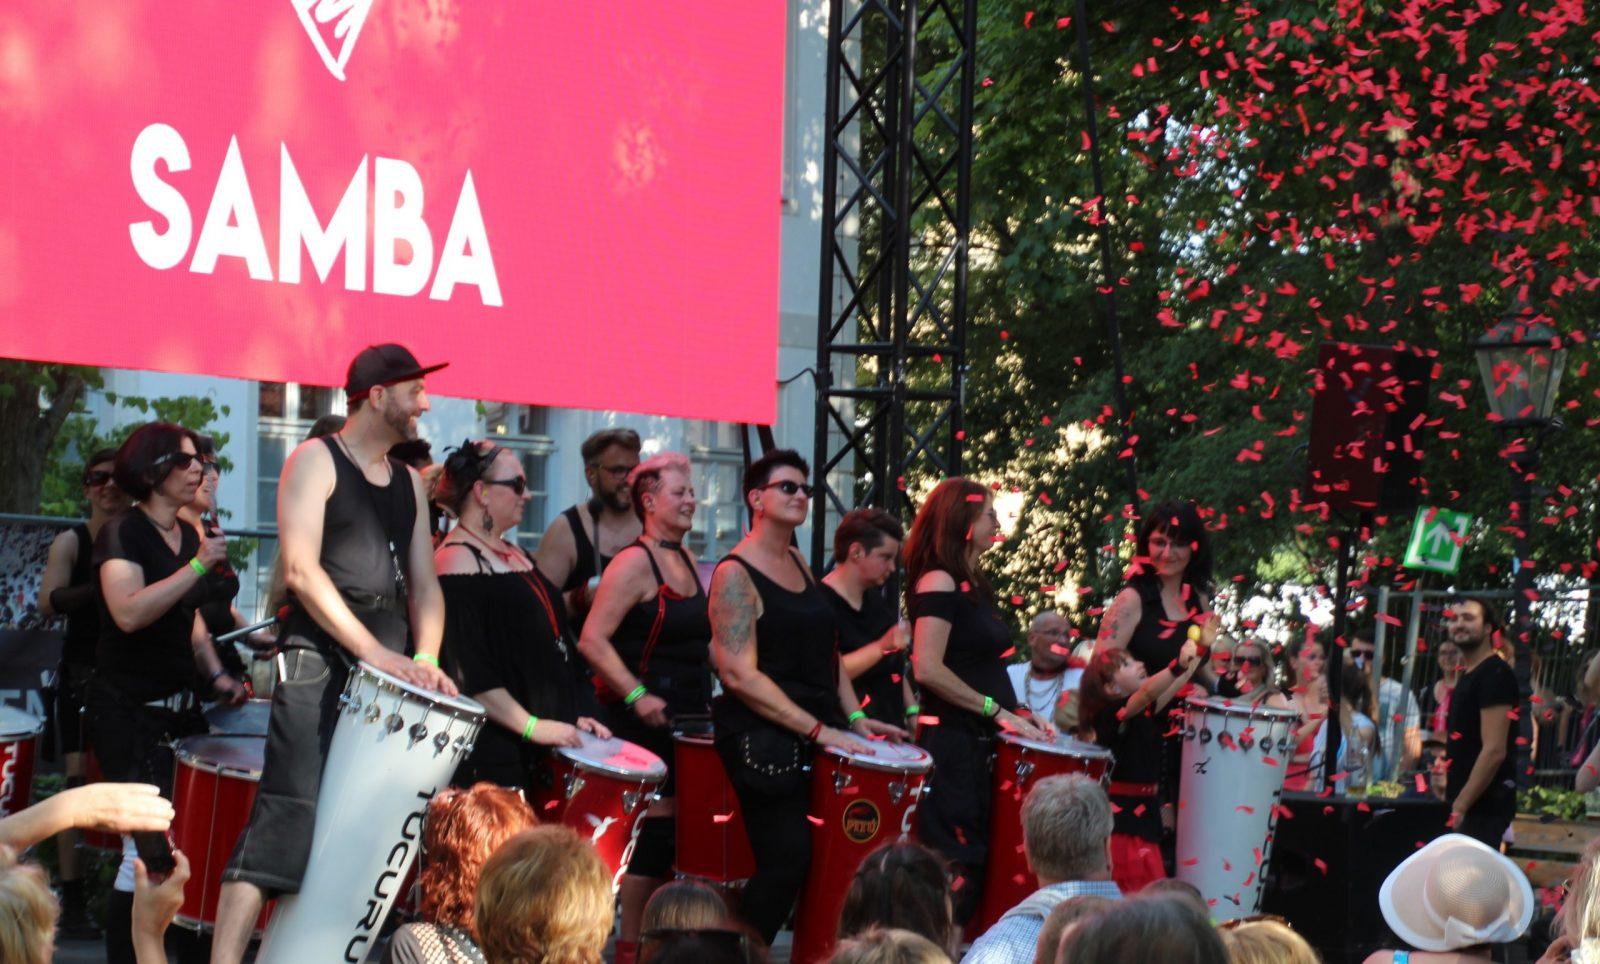 Sambafestival 2020